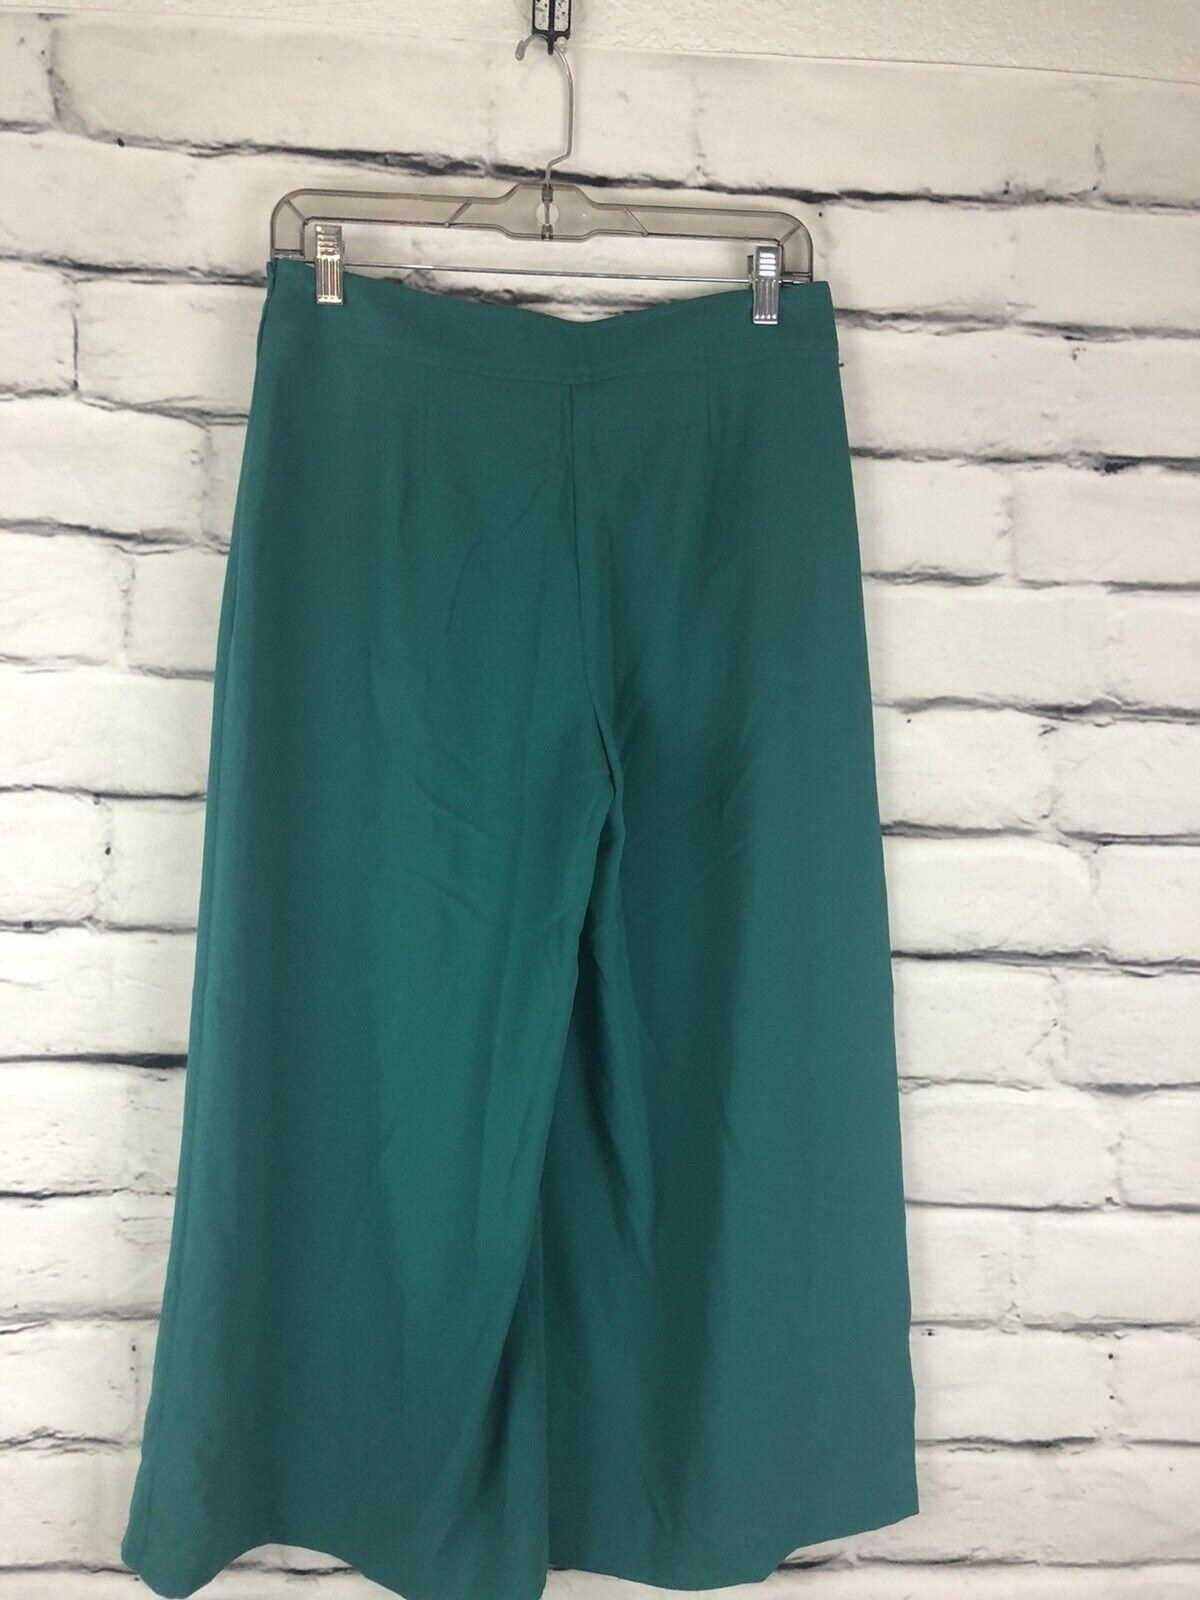 Trina Turk Womens Teal Size 12 Gaucho Pants  - image 2